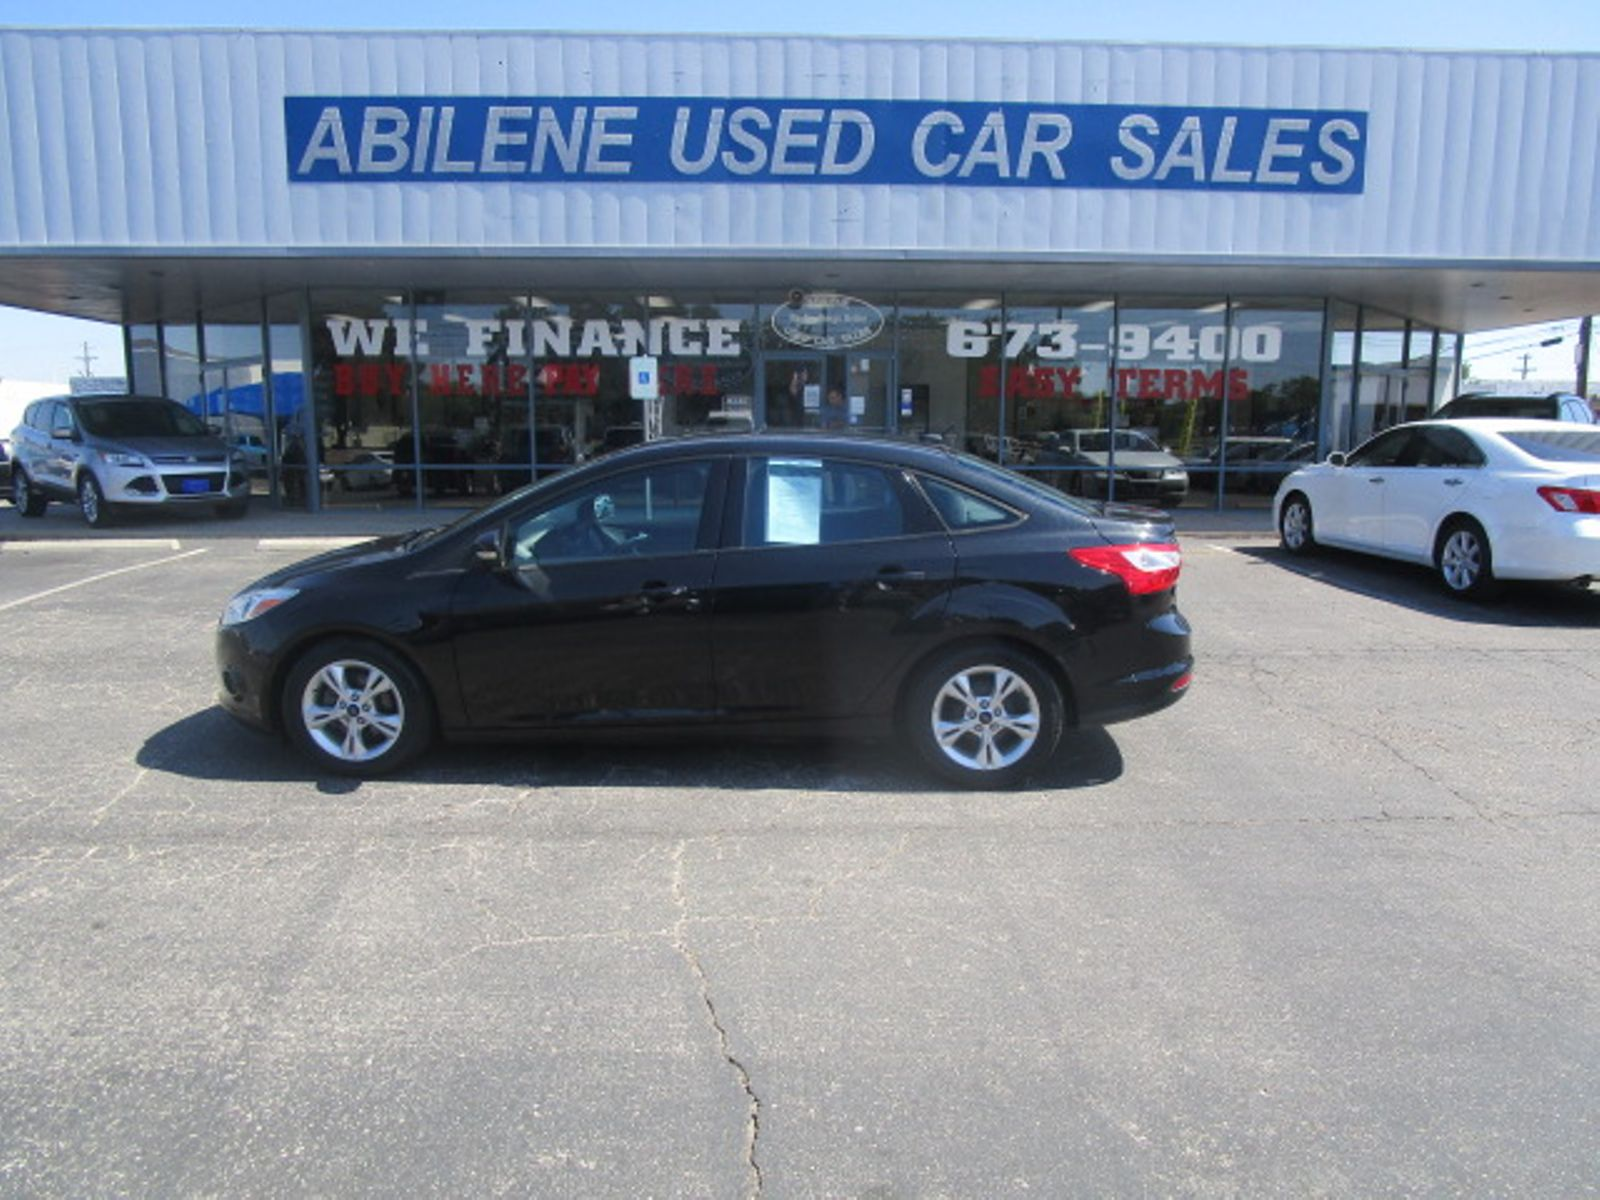 Used Cars Abilene Tx >> 2014 Ford Focus Se Abilene Tx Abilene Used Car Sales